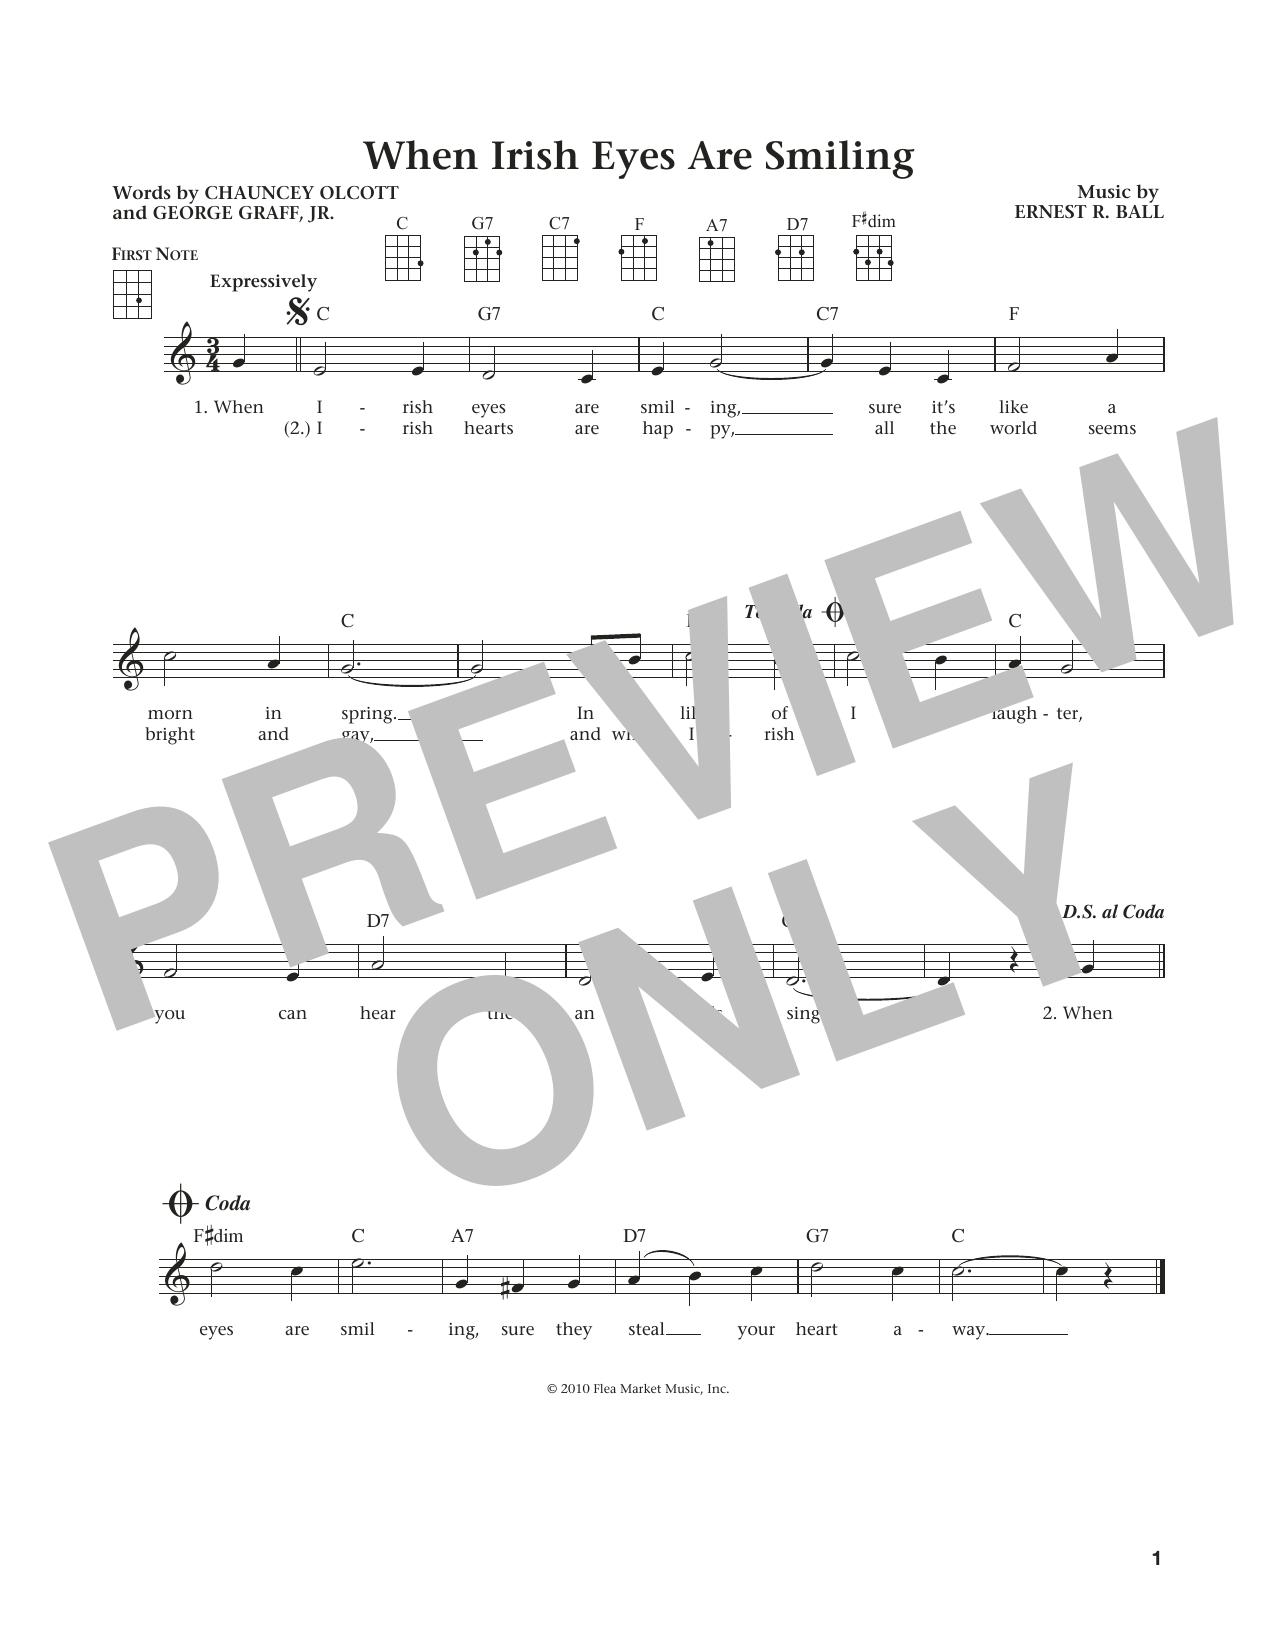 Sheet Music Digital Files To Print Licensed George Graff Jr